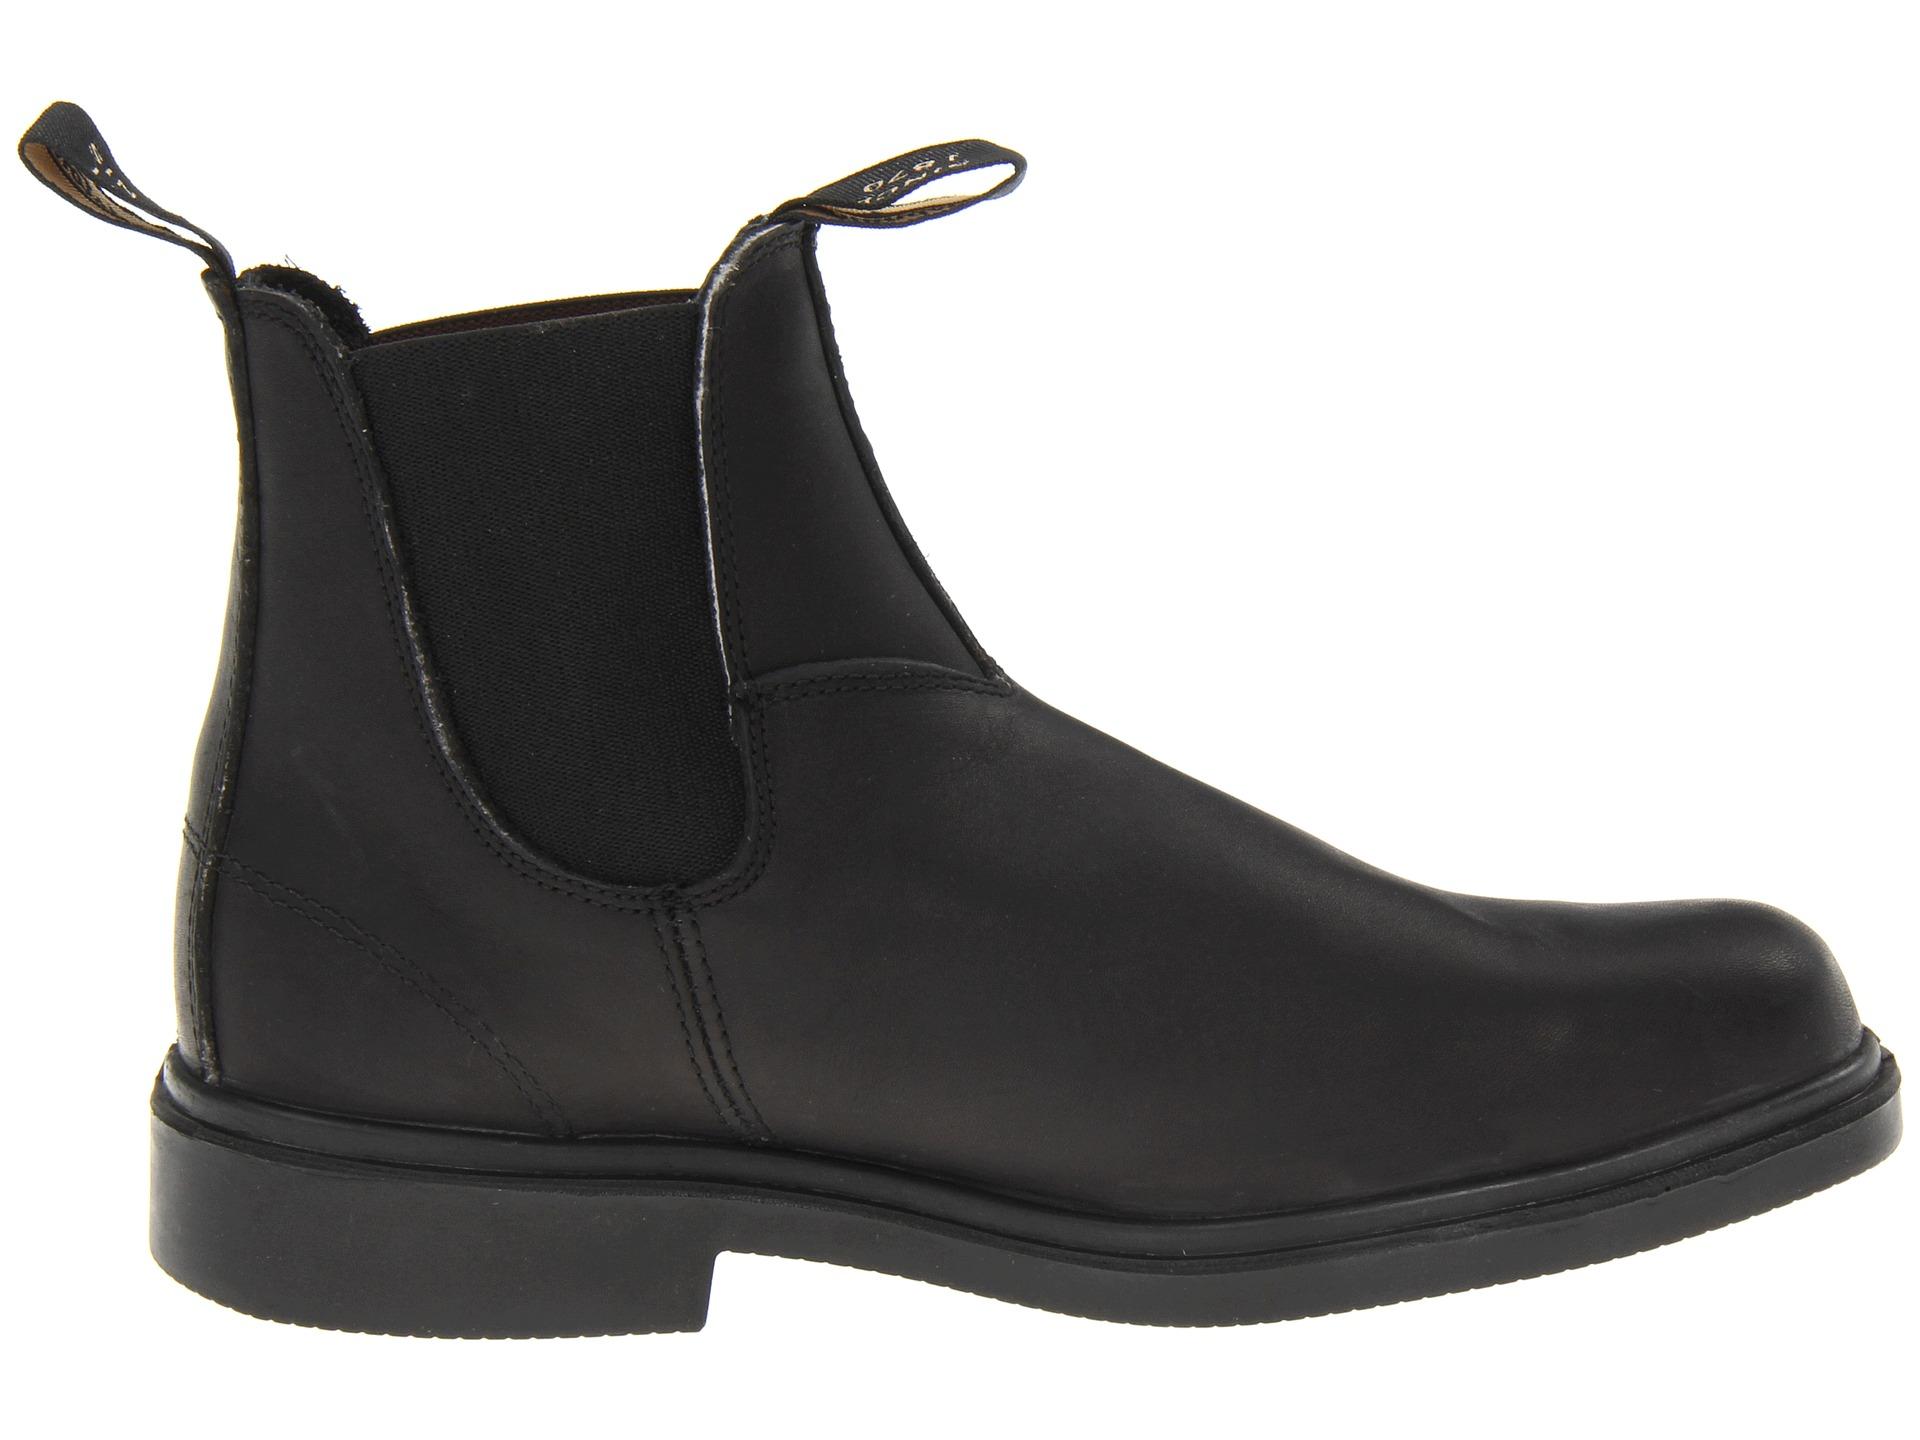 Blundstone Shoes Sale